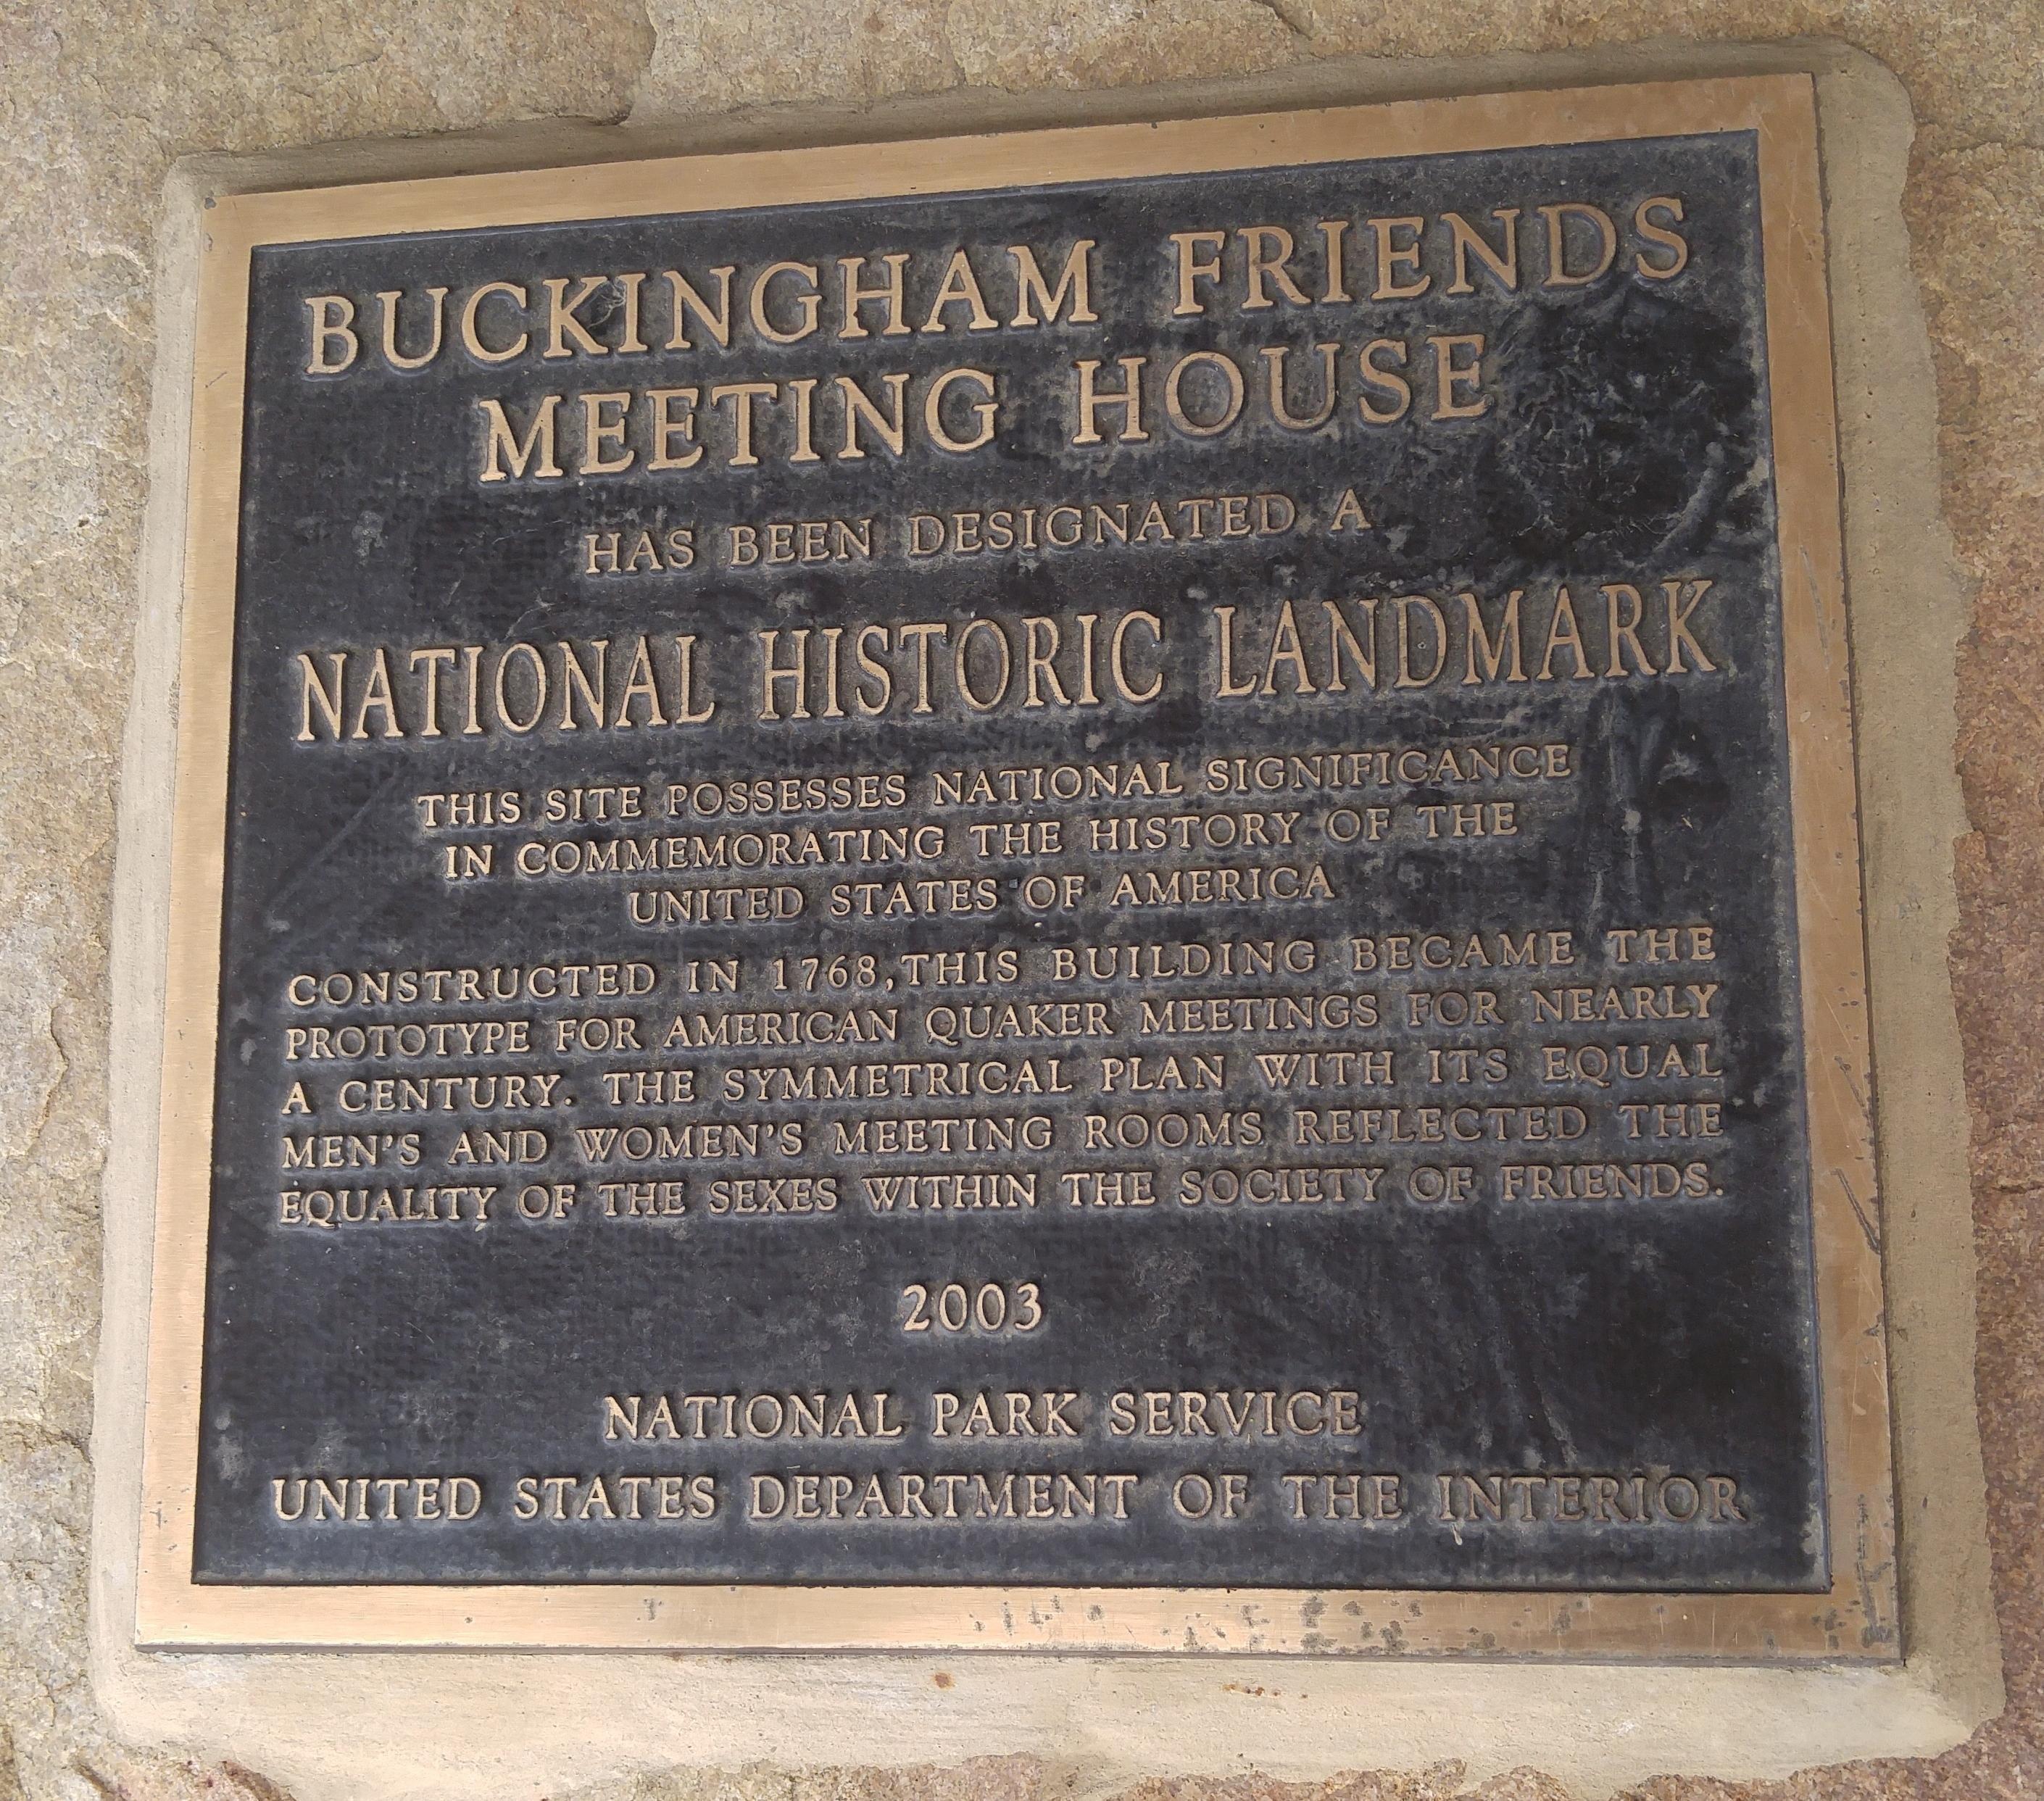 The National Historic Landmark plaque that adorns the building's exterior.